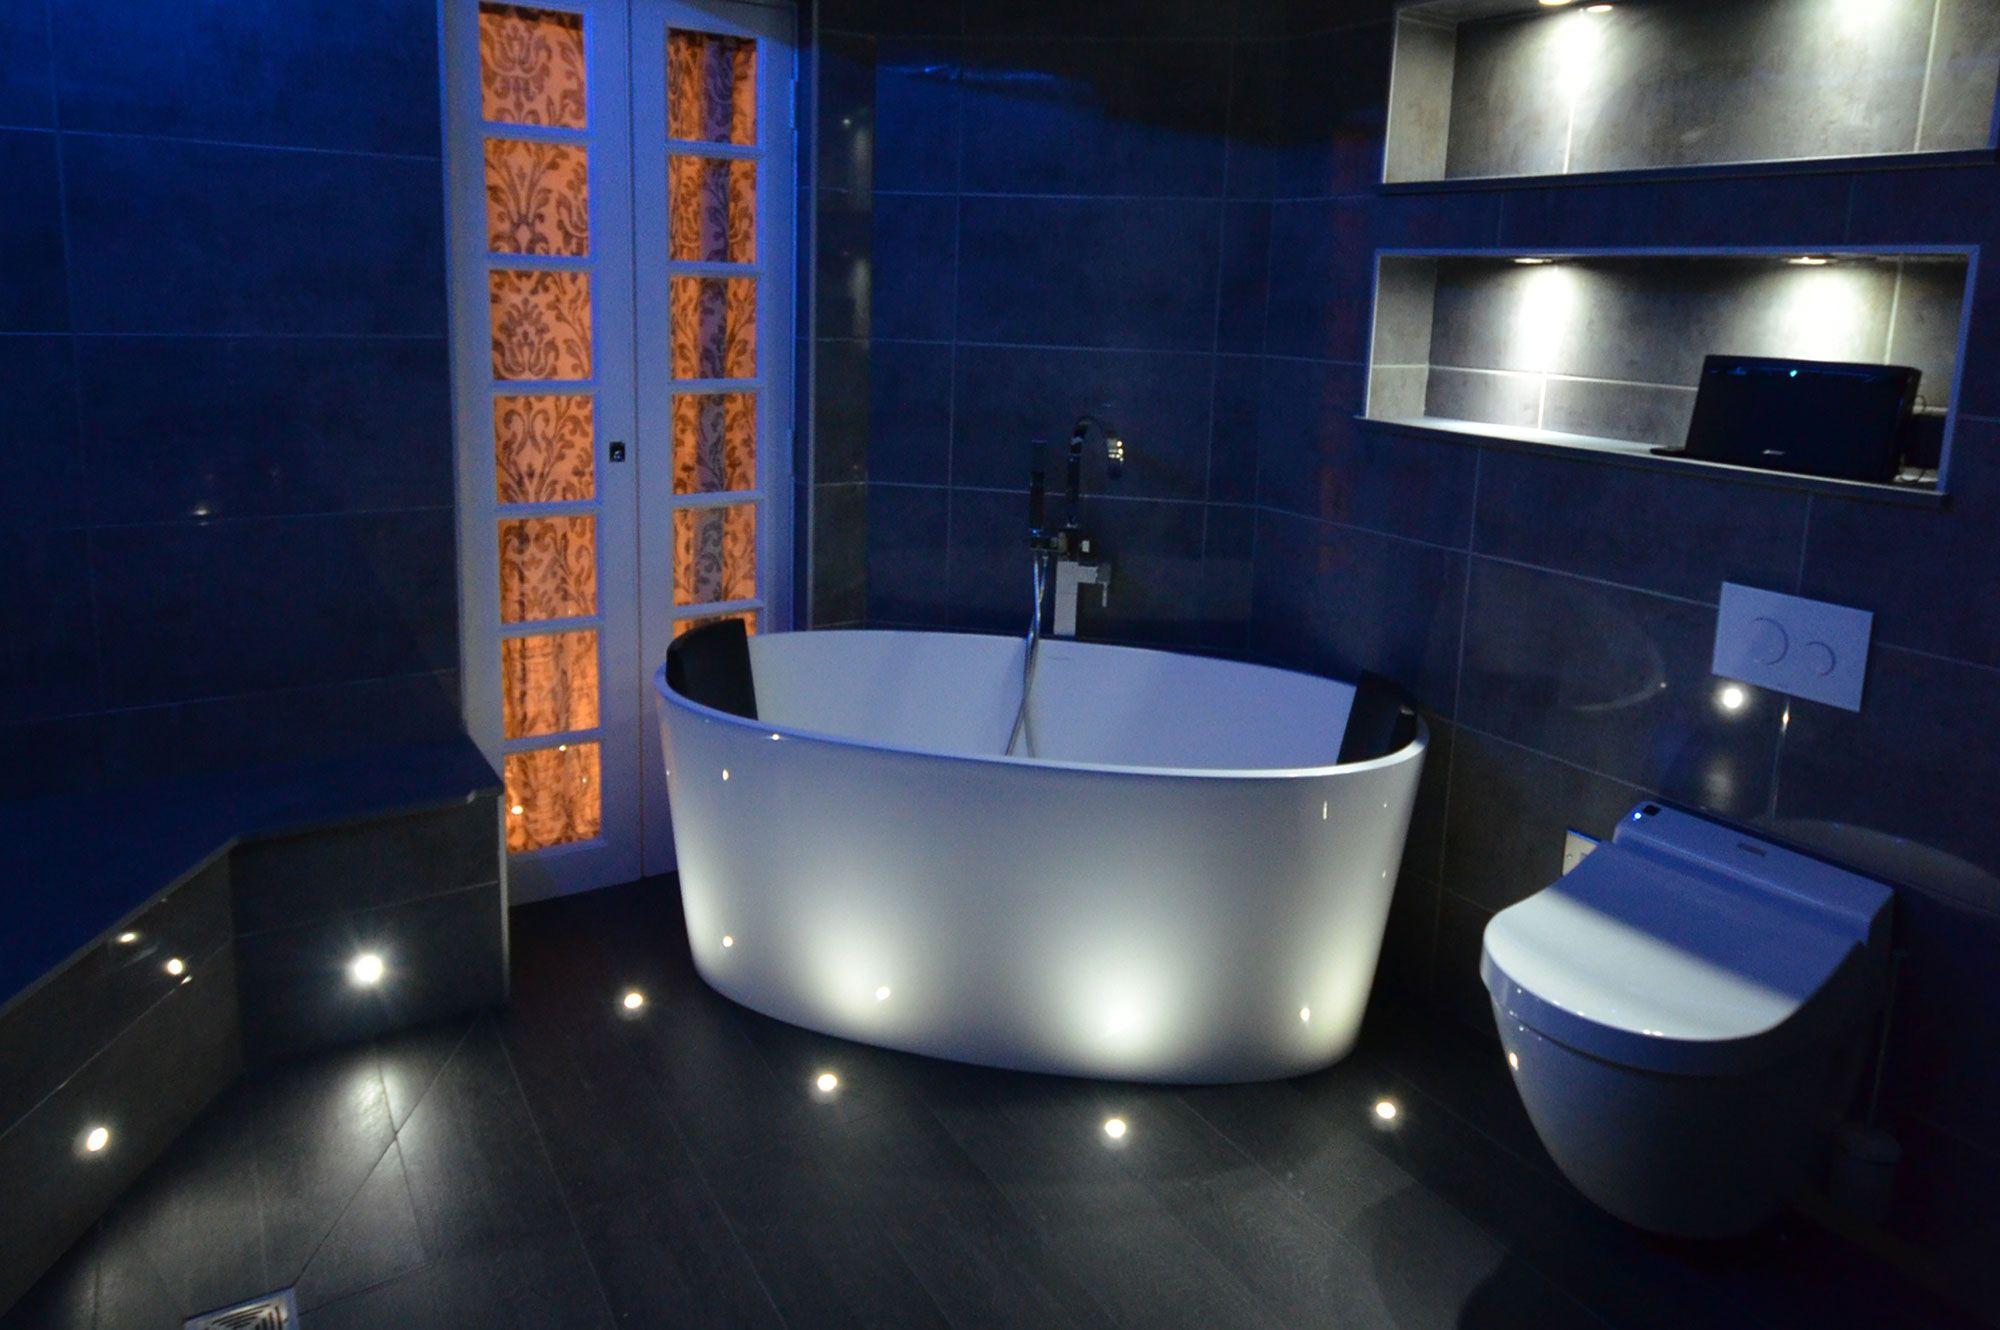 Bathroom Ideas Led Mood Lighting Rockash Bath Bathroom pertaining to dimensions 2000 X 1330